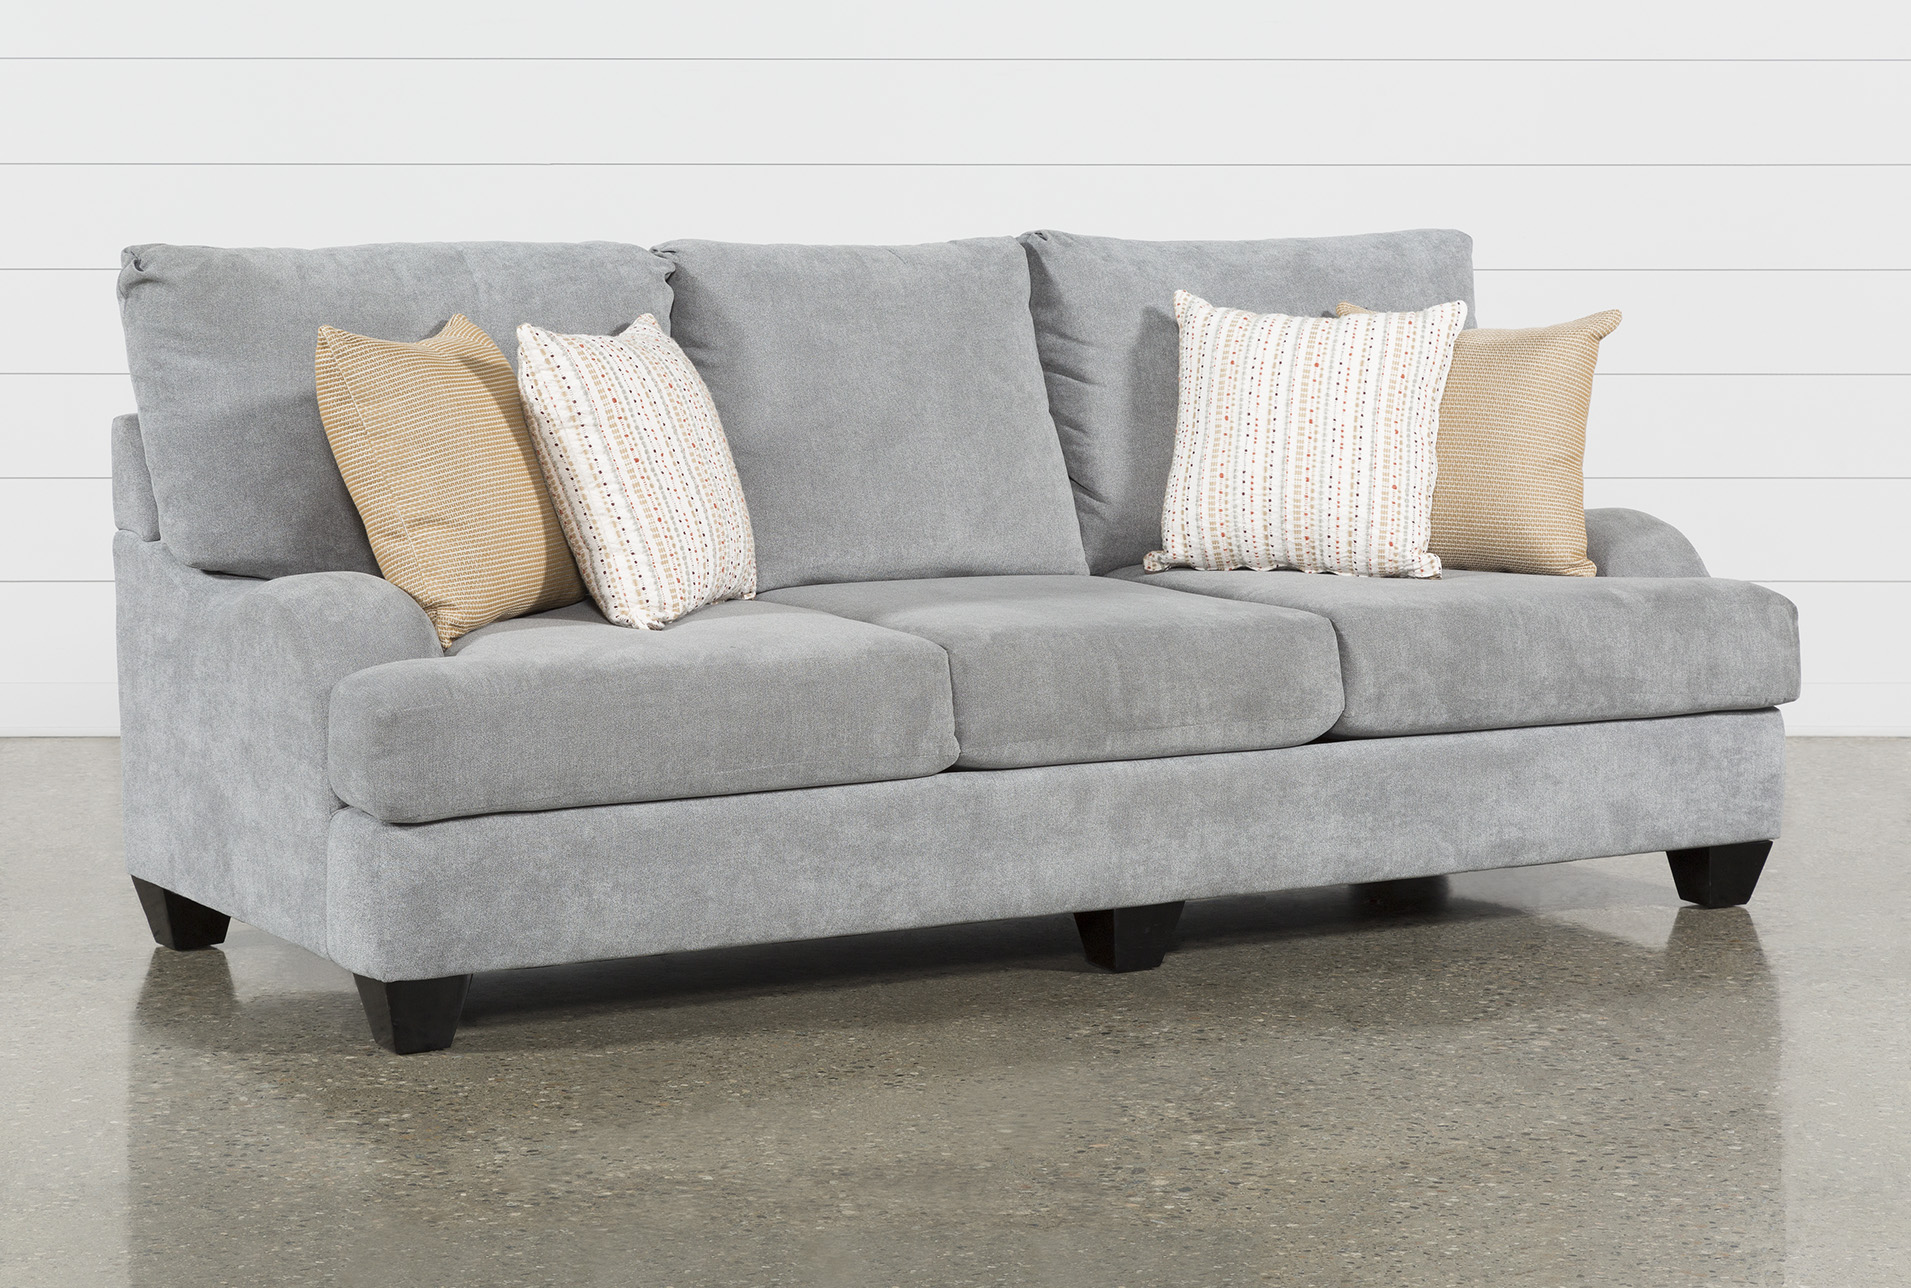 Sierra Foam III Sofa | Living Spaces